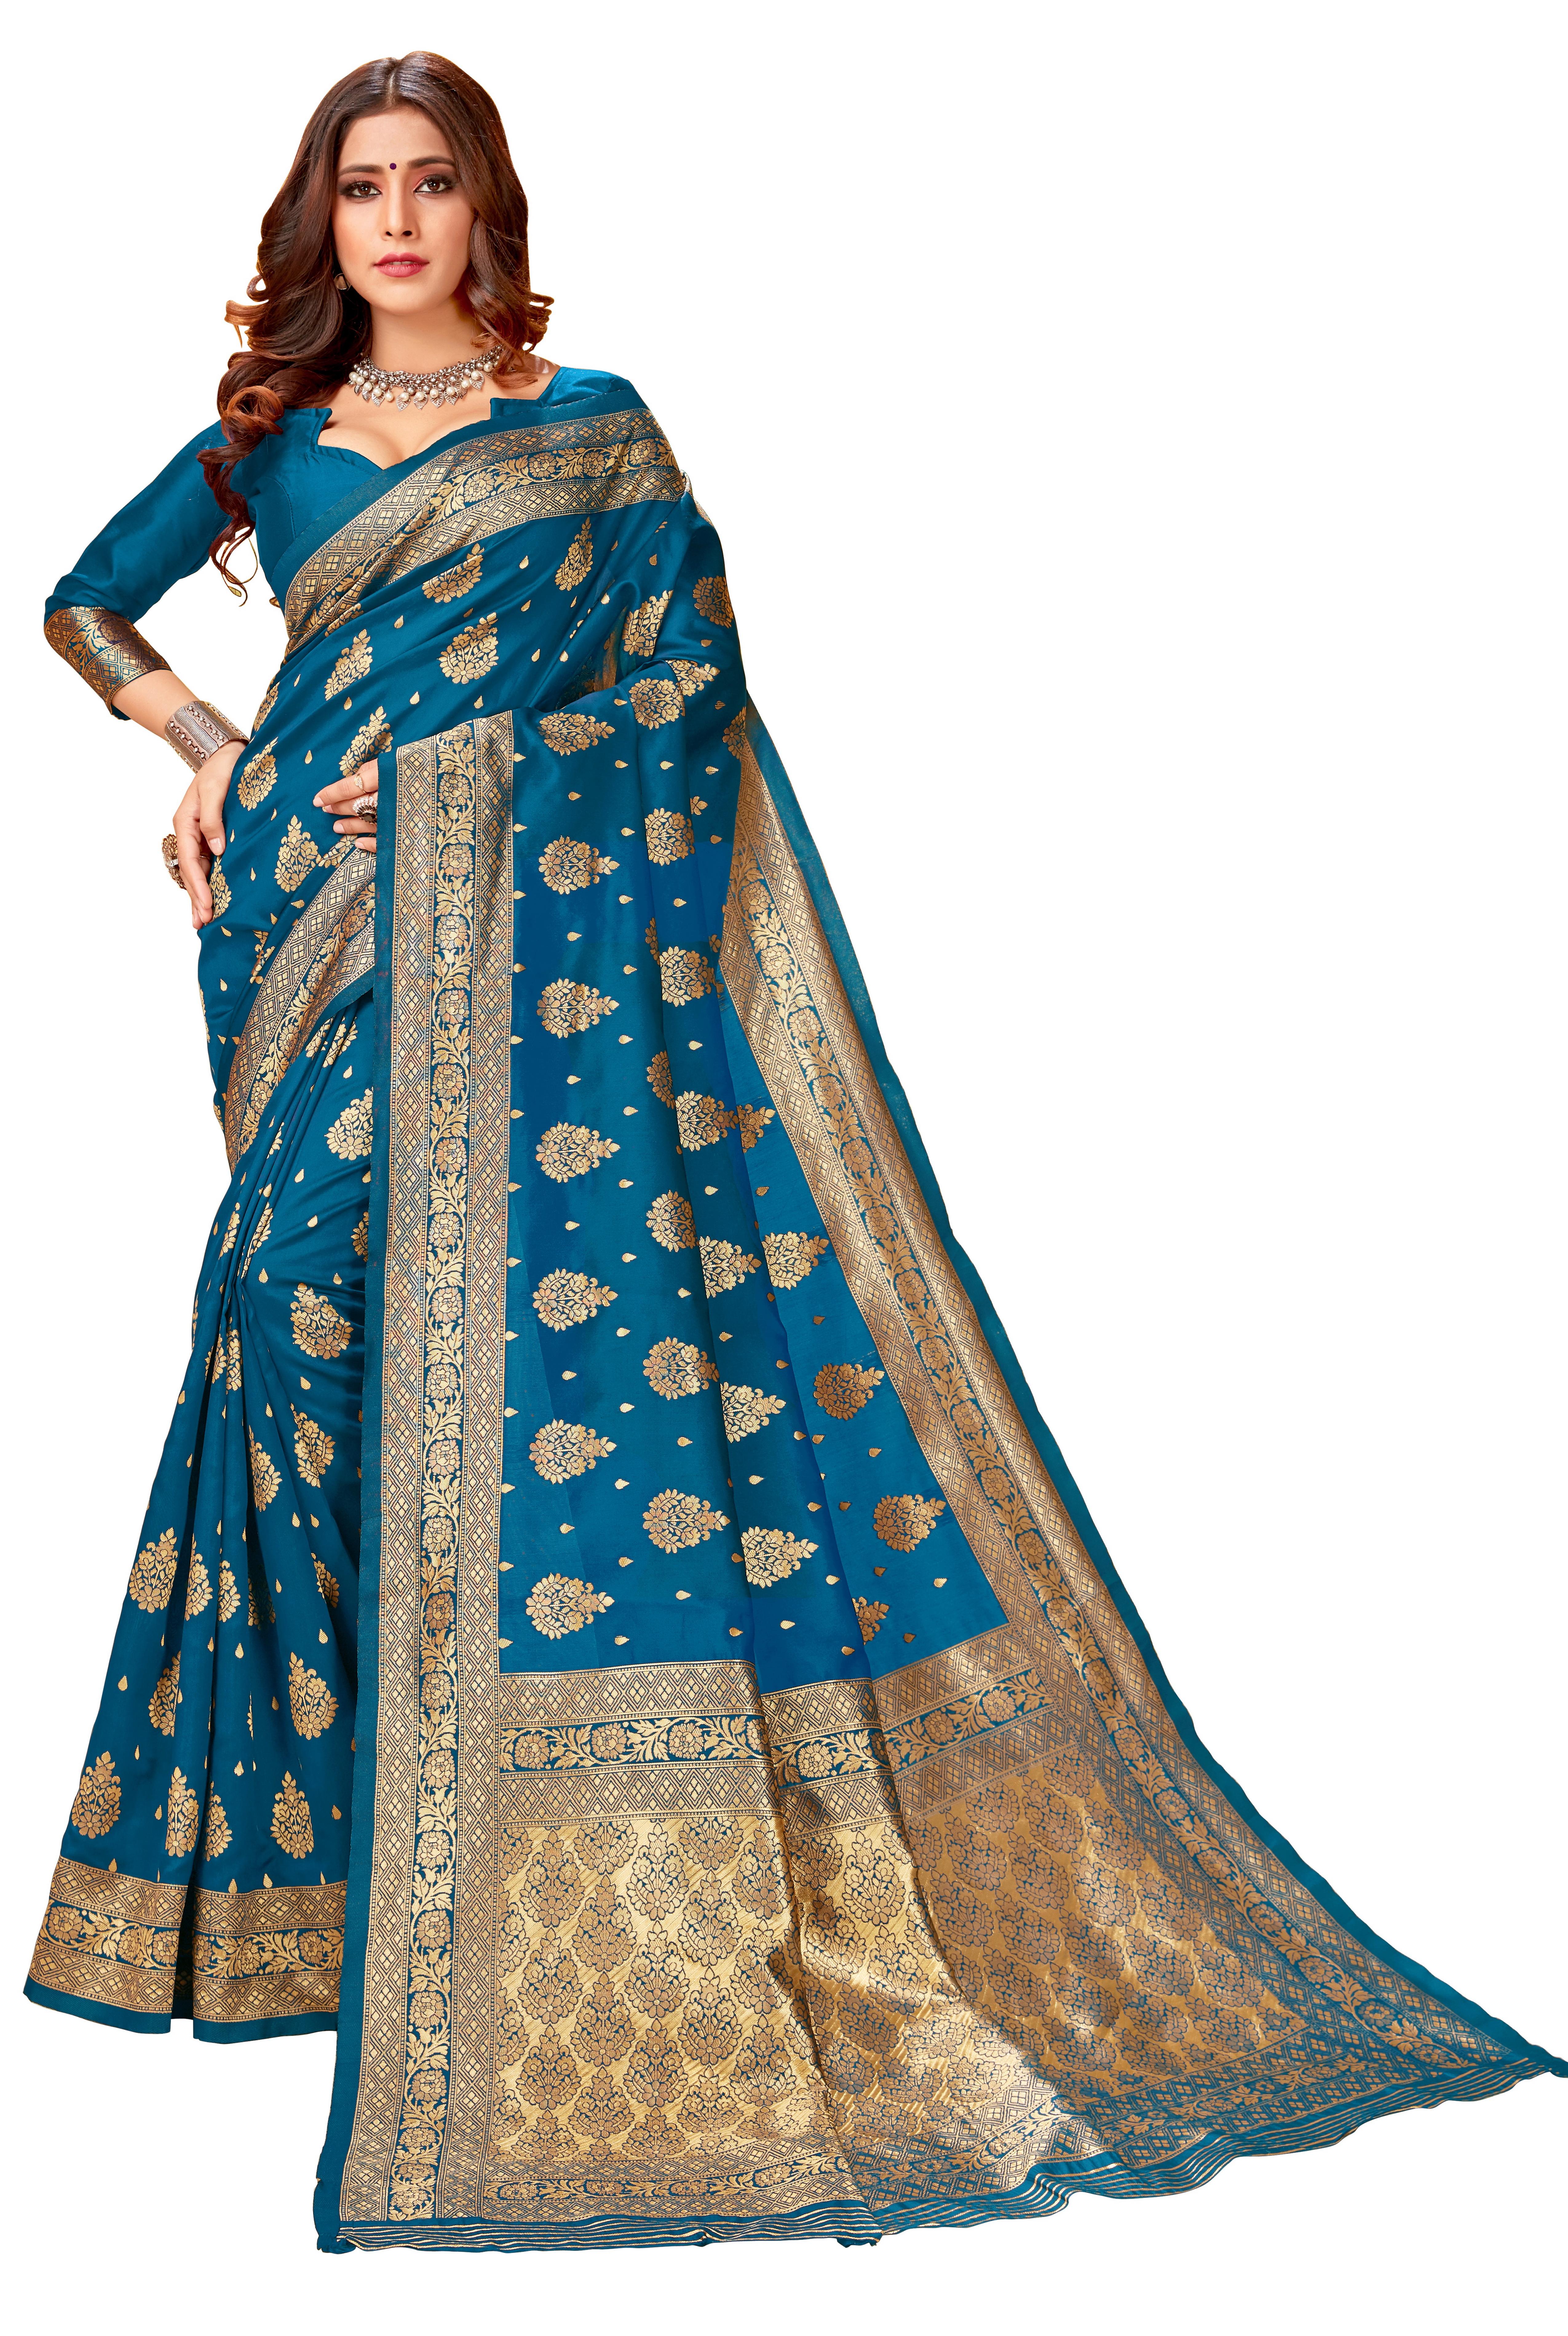 Glemora | Glemora Rama Lichi Silk Lavanya Saree With Unstitched Blouse